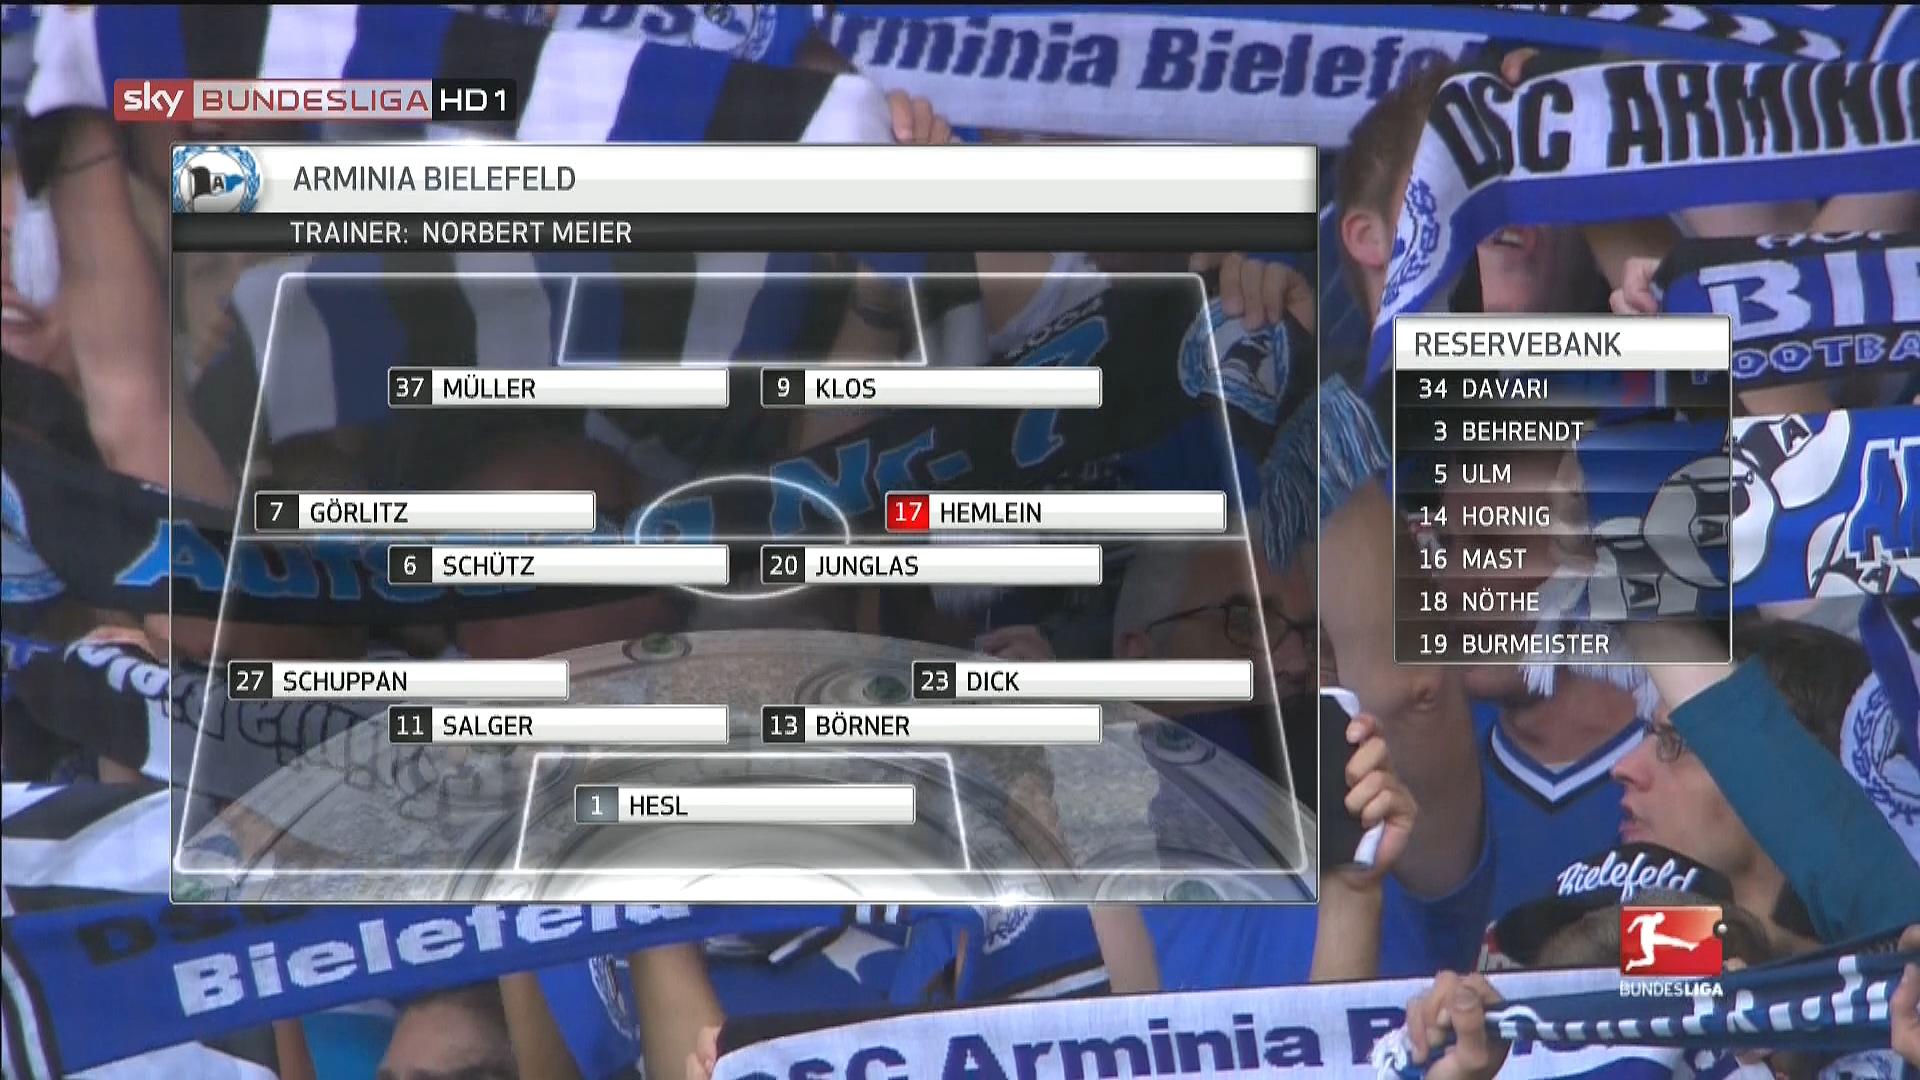 Knkfq Futbol Bundesliga 2